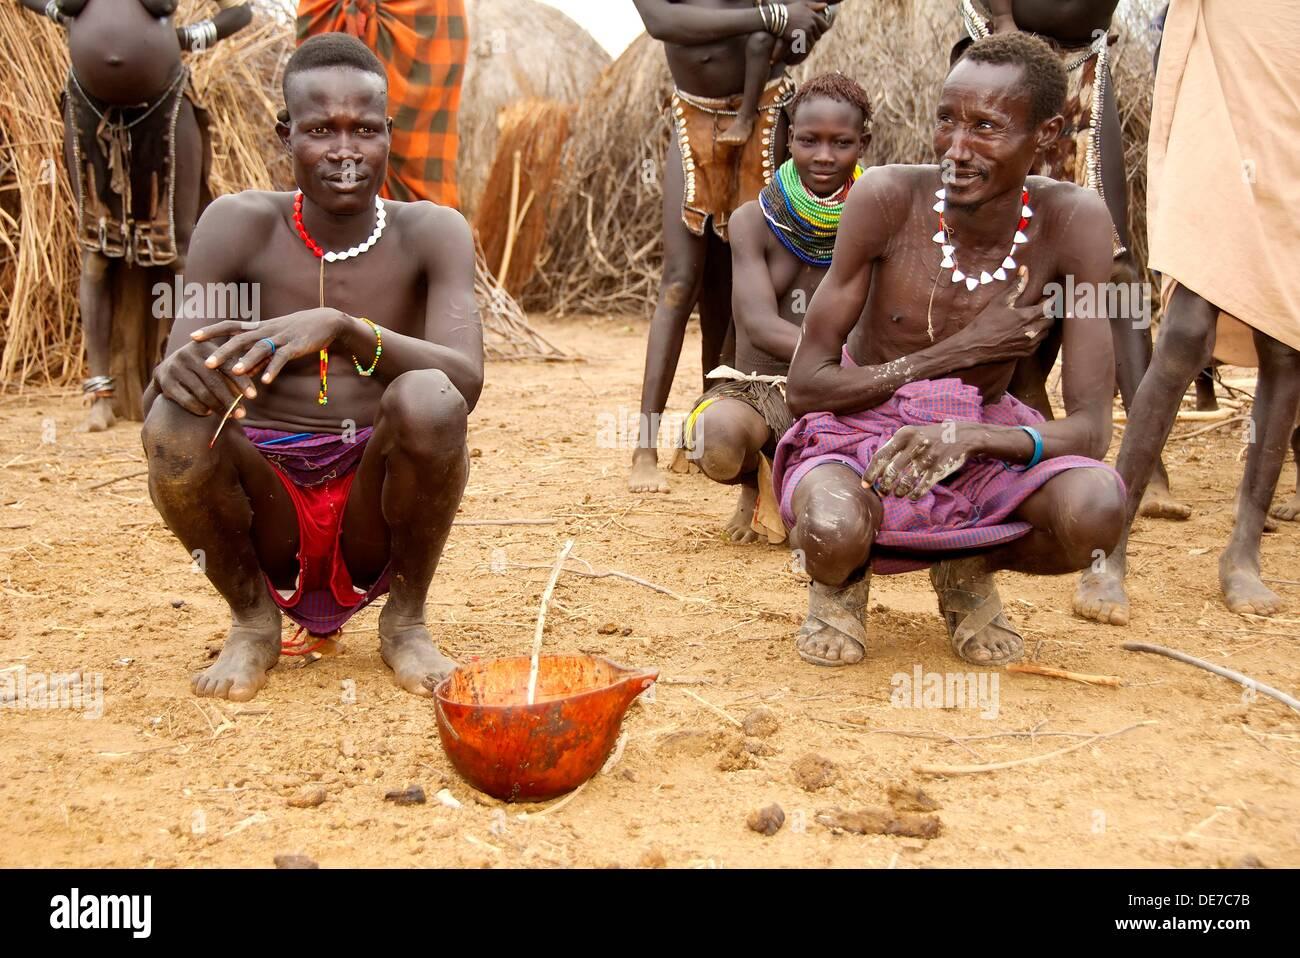 Nyangatom Bumi men sharing a calabash of cow blood, Omo river valley, Ethiopia Stock Photo